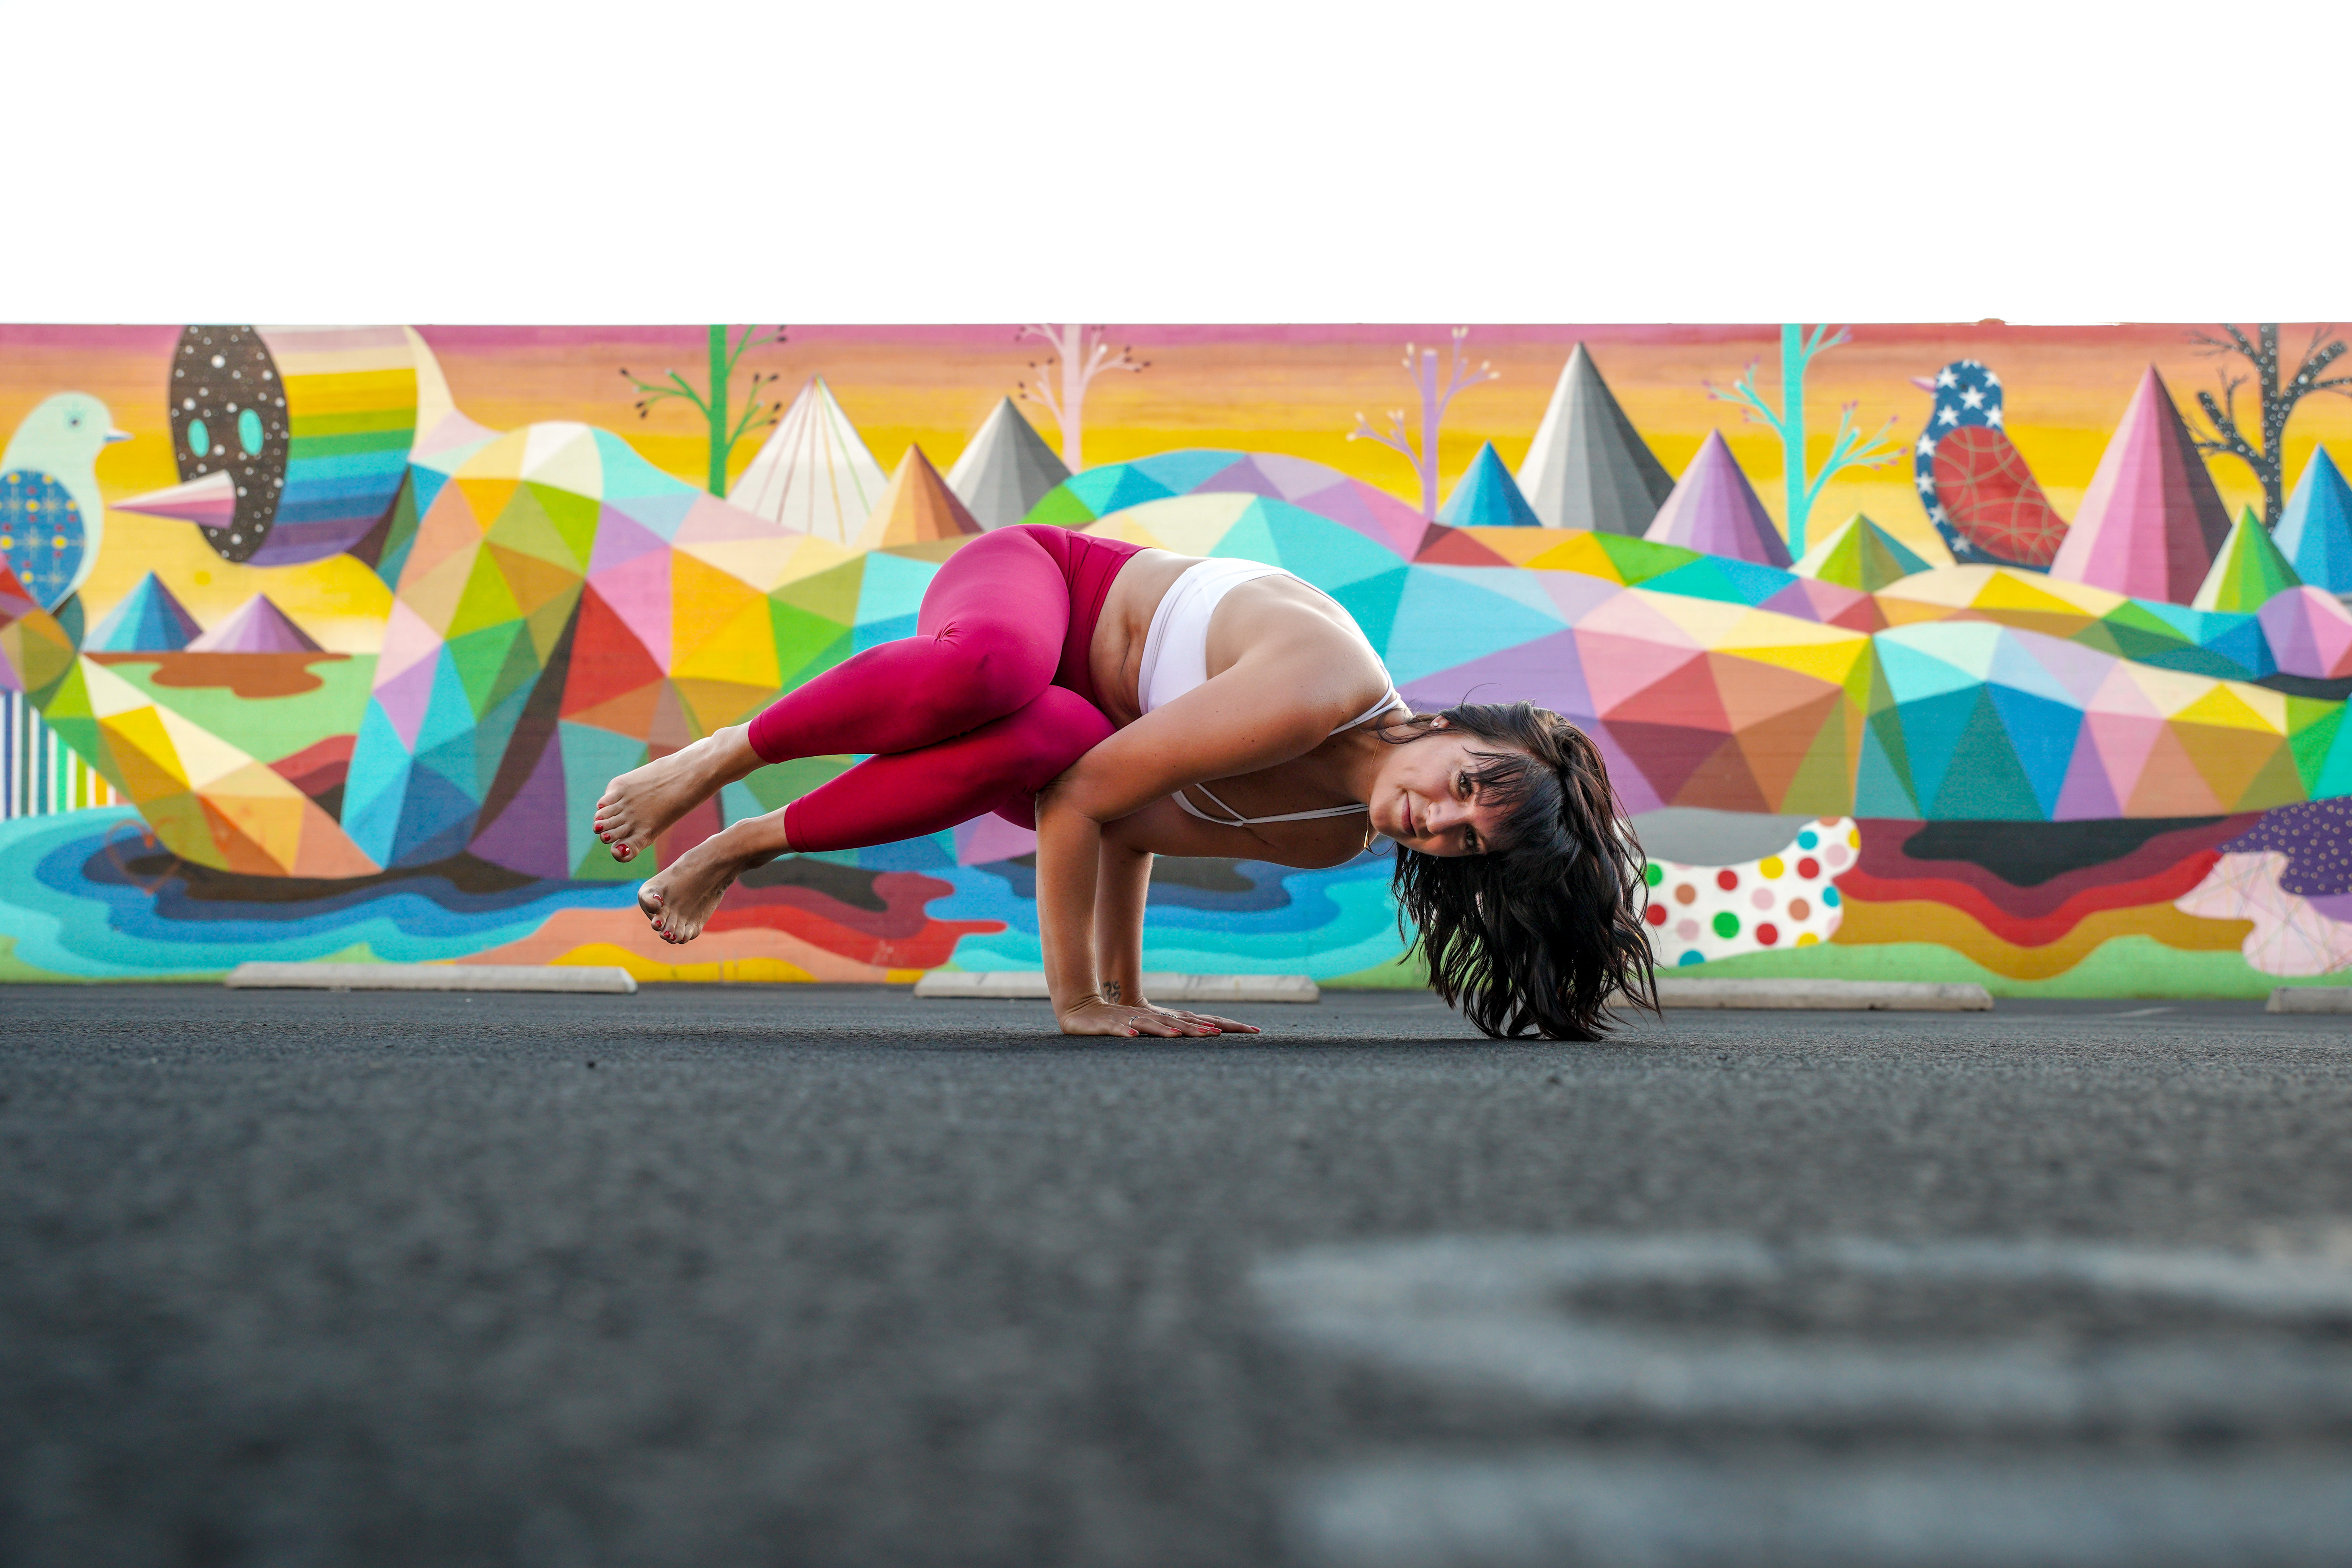 Jessica L. yoga freemont TBTM19-110